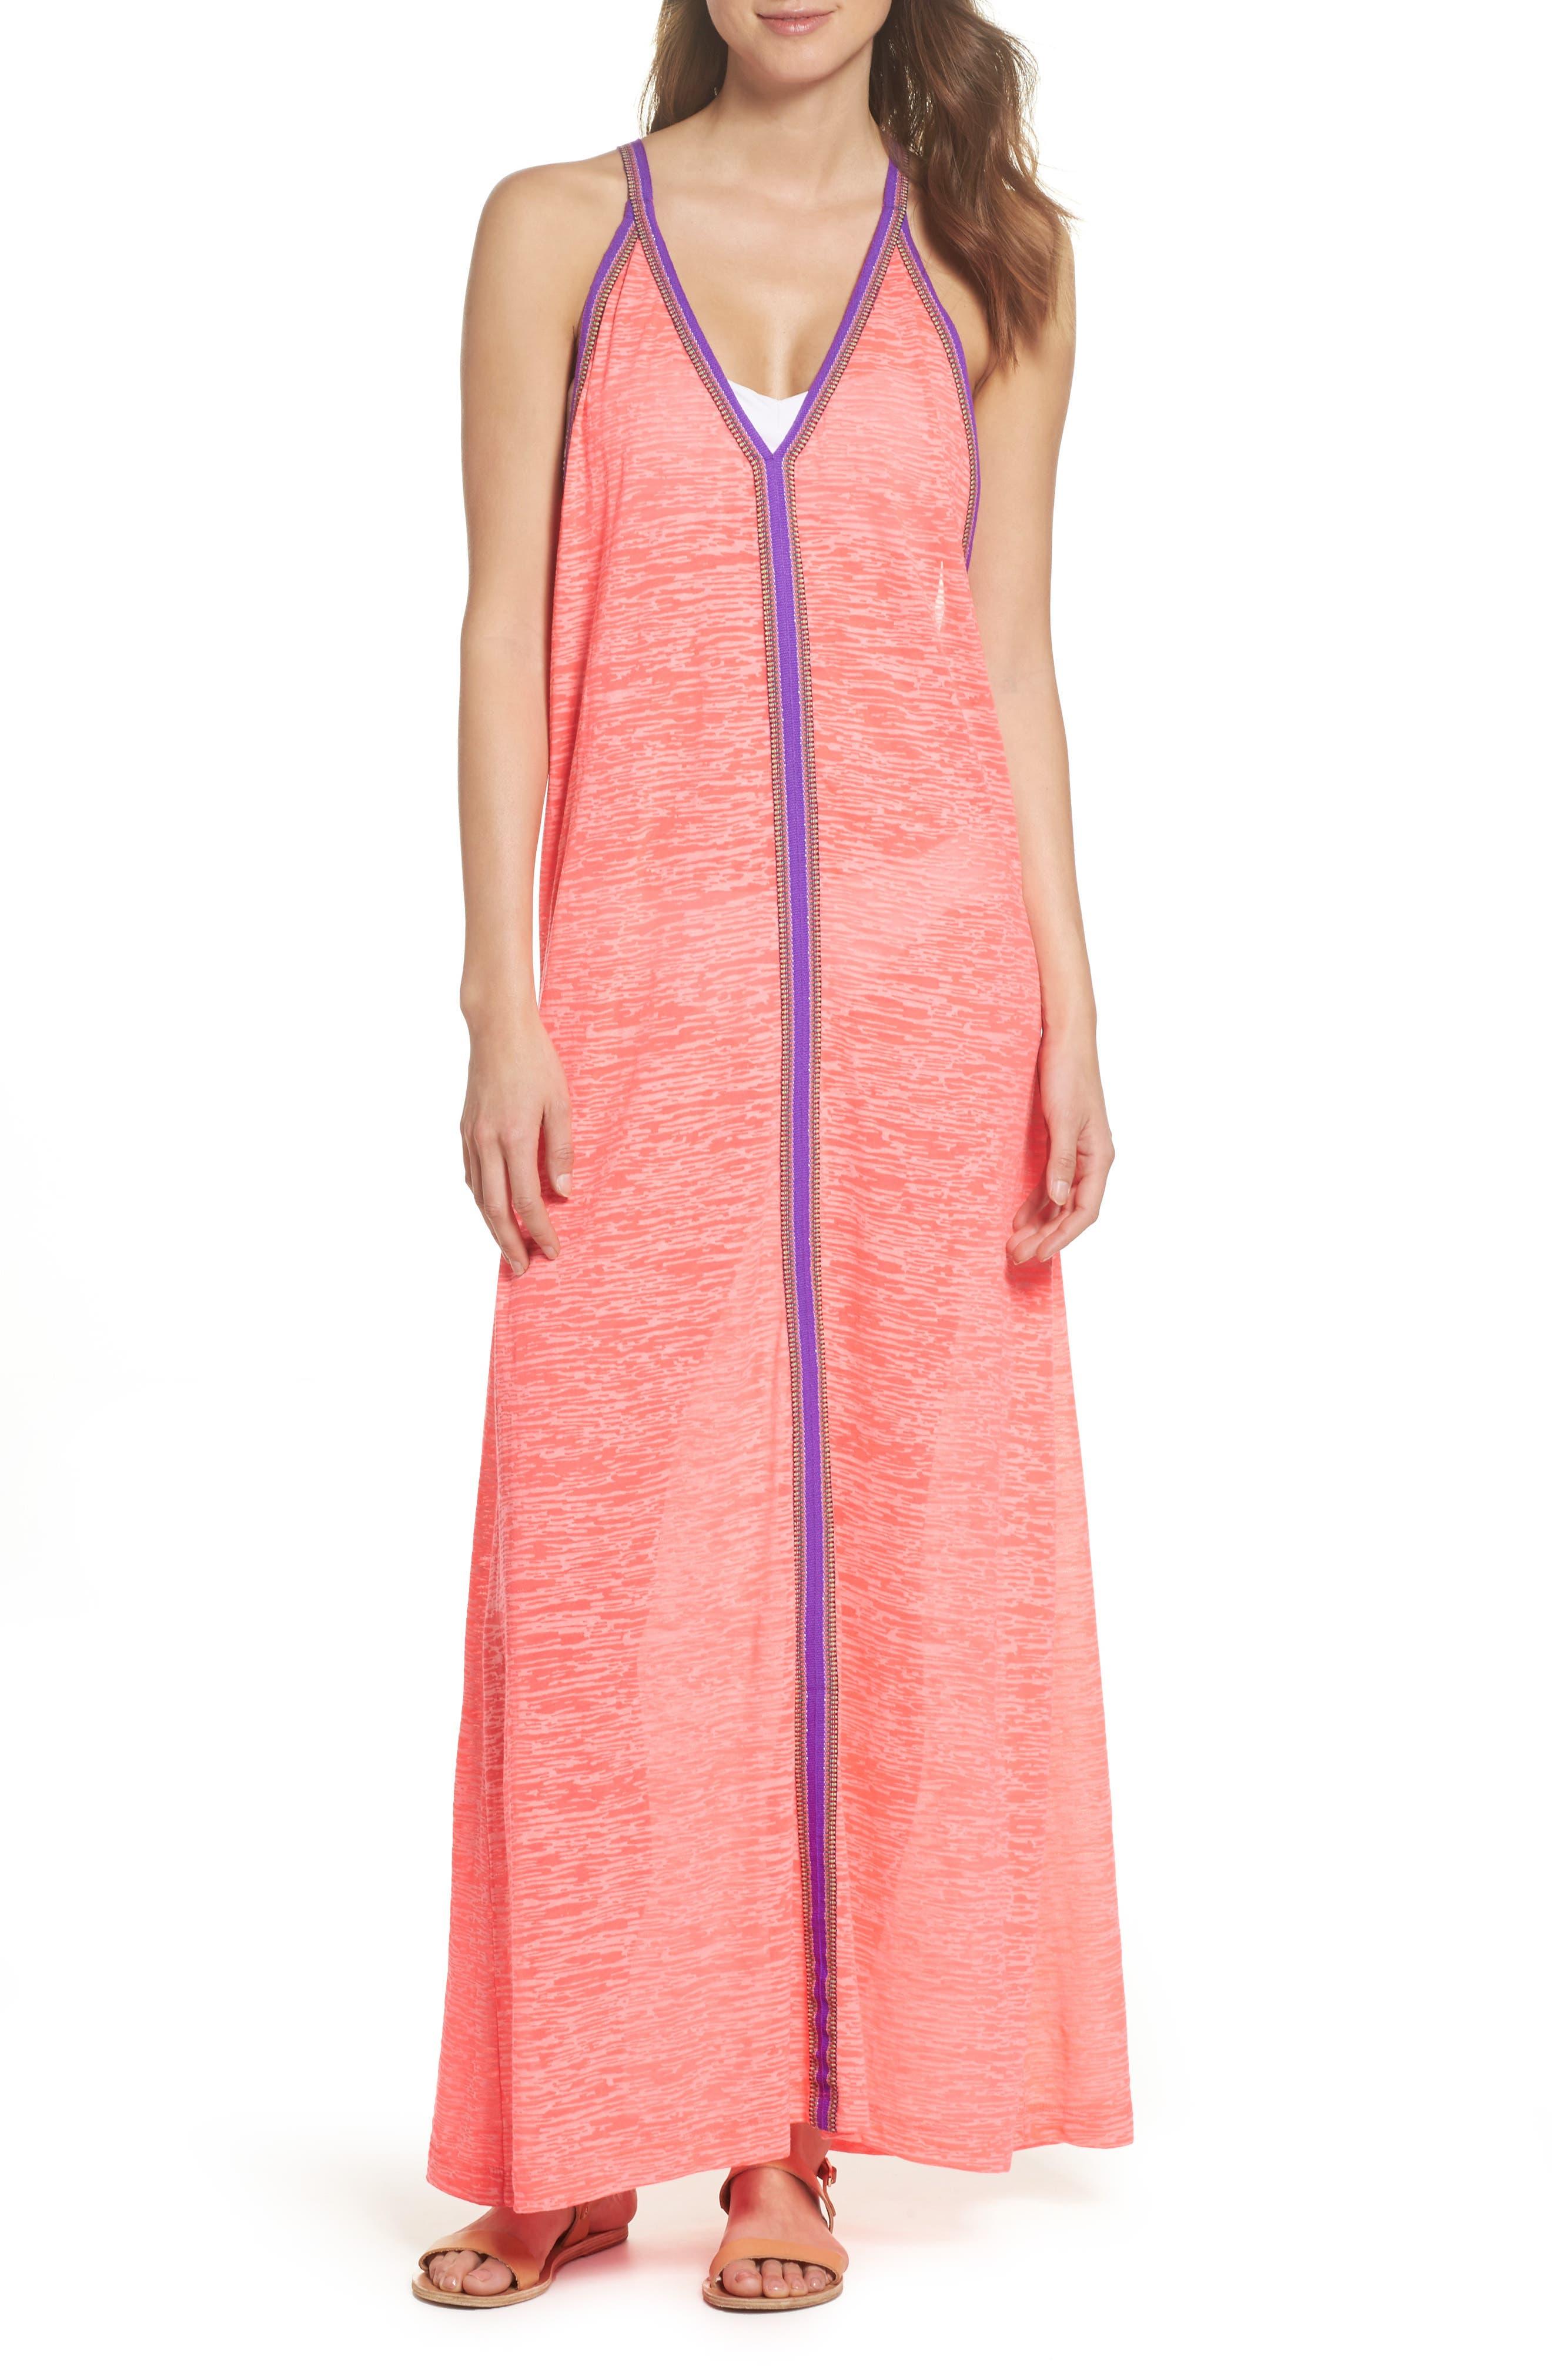 Inca Cover-Up Maxi Sundress,                         Main,                         color, Hot Pink